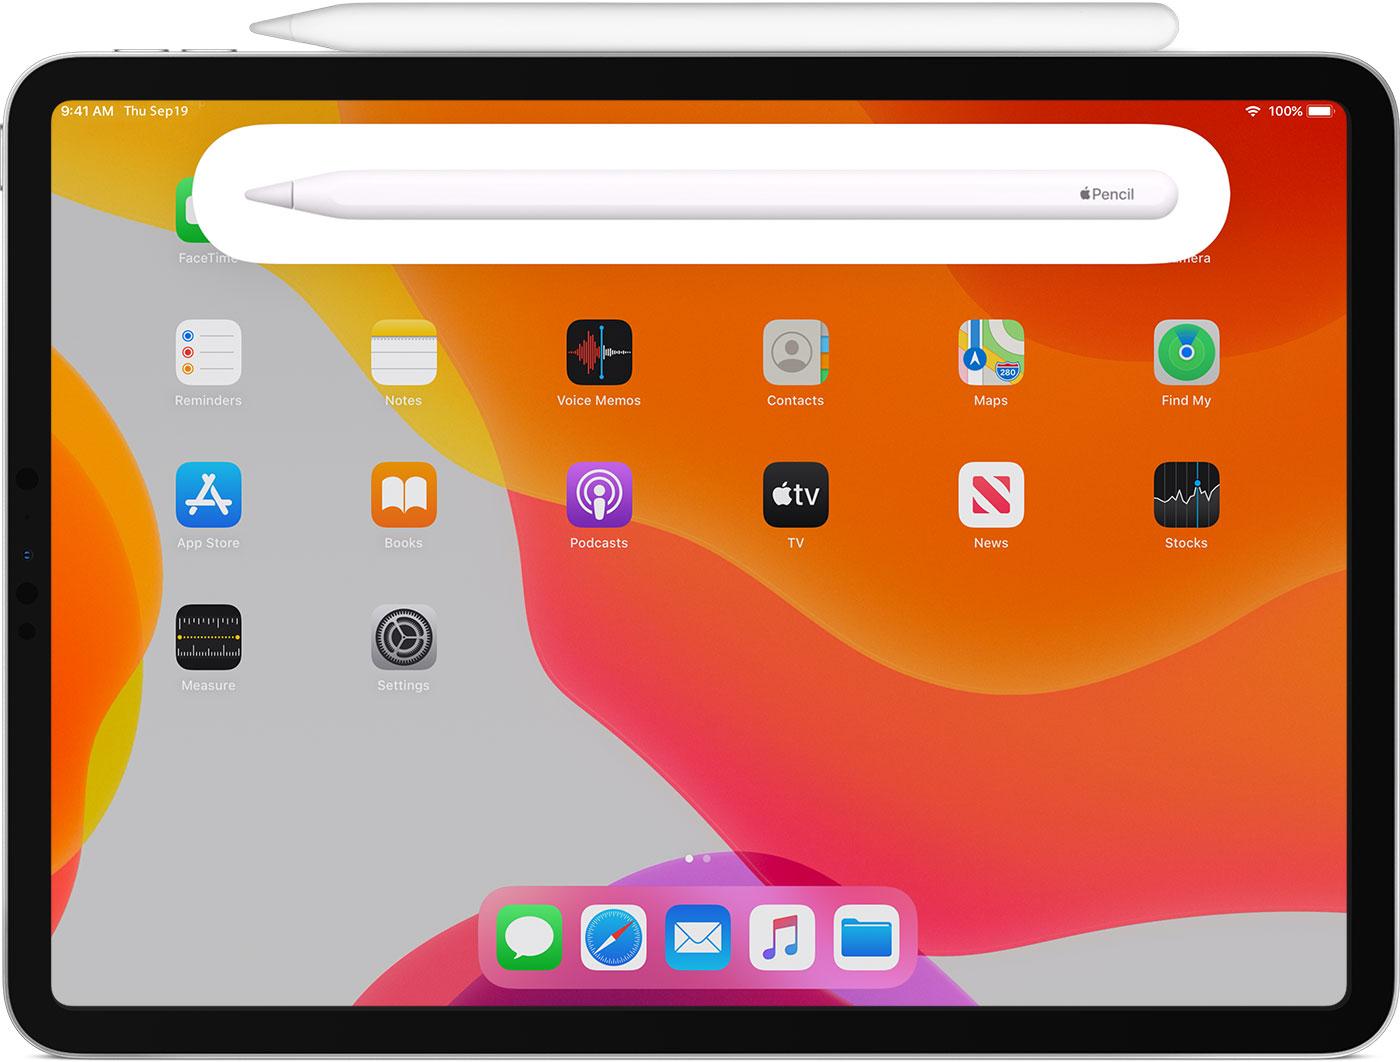 ios13-ipad-pro-apple-pencil-connect.jpg